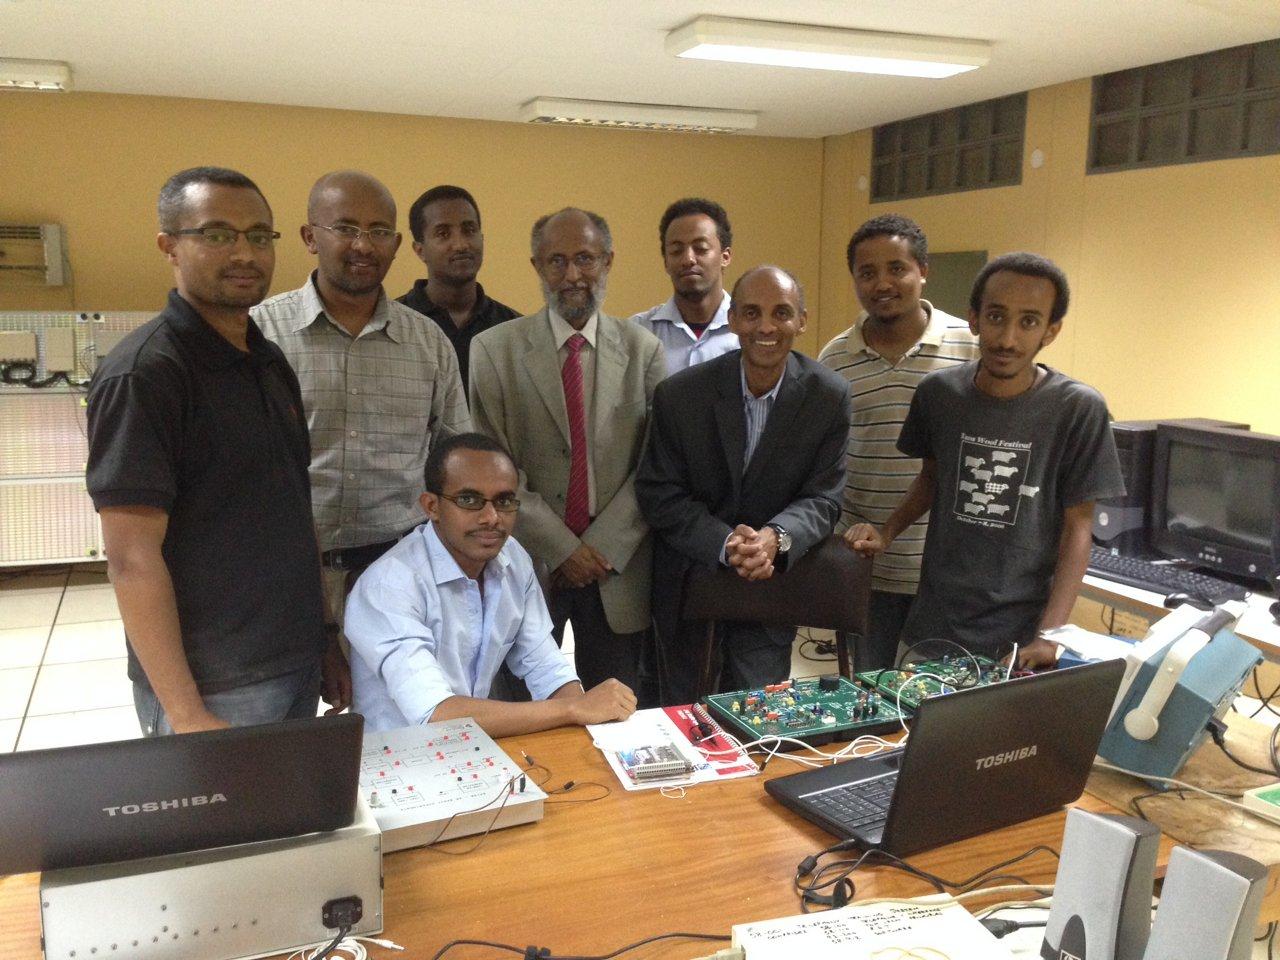 Yacob Ethiopia Team